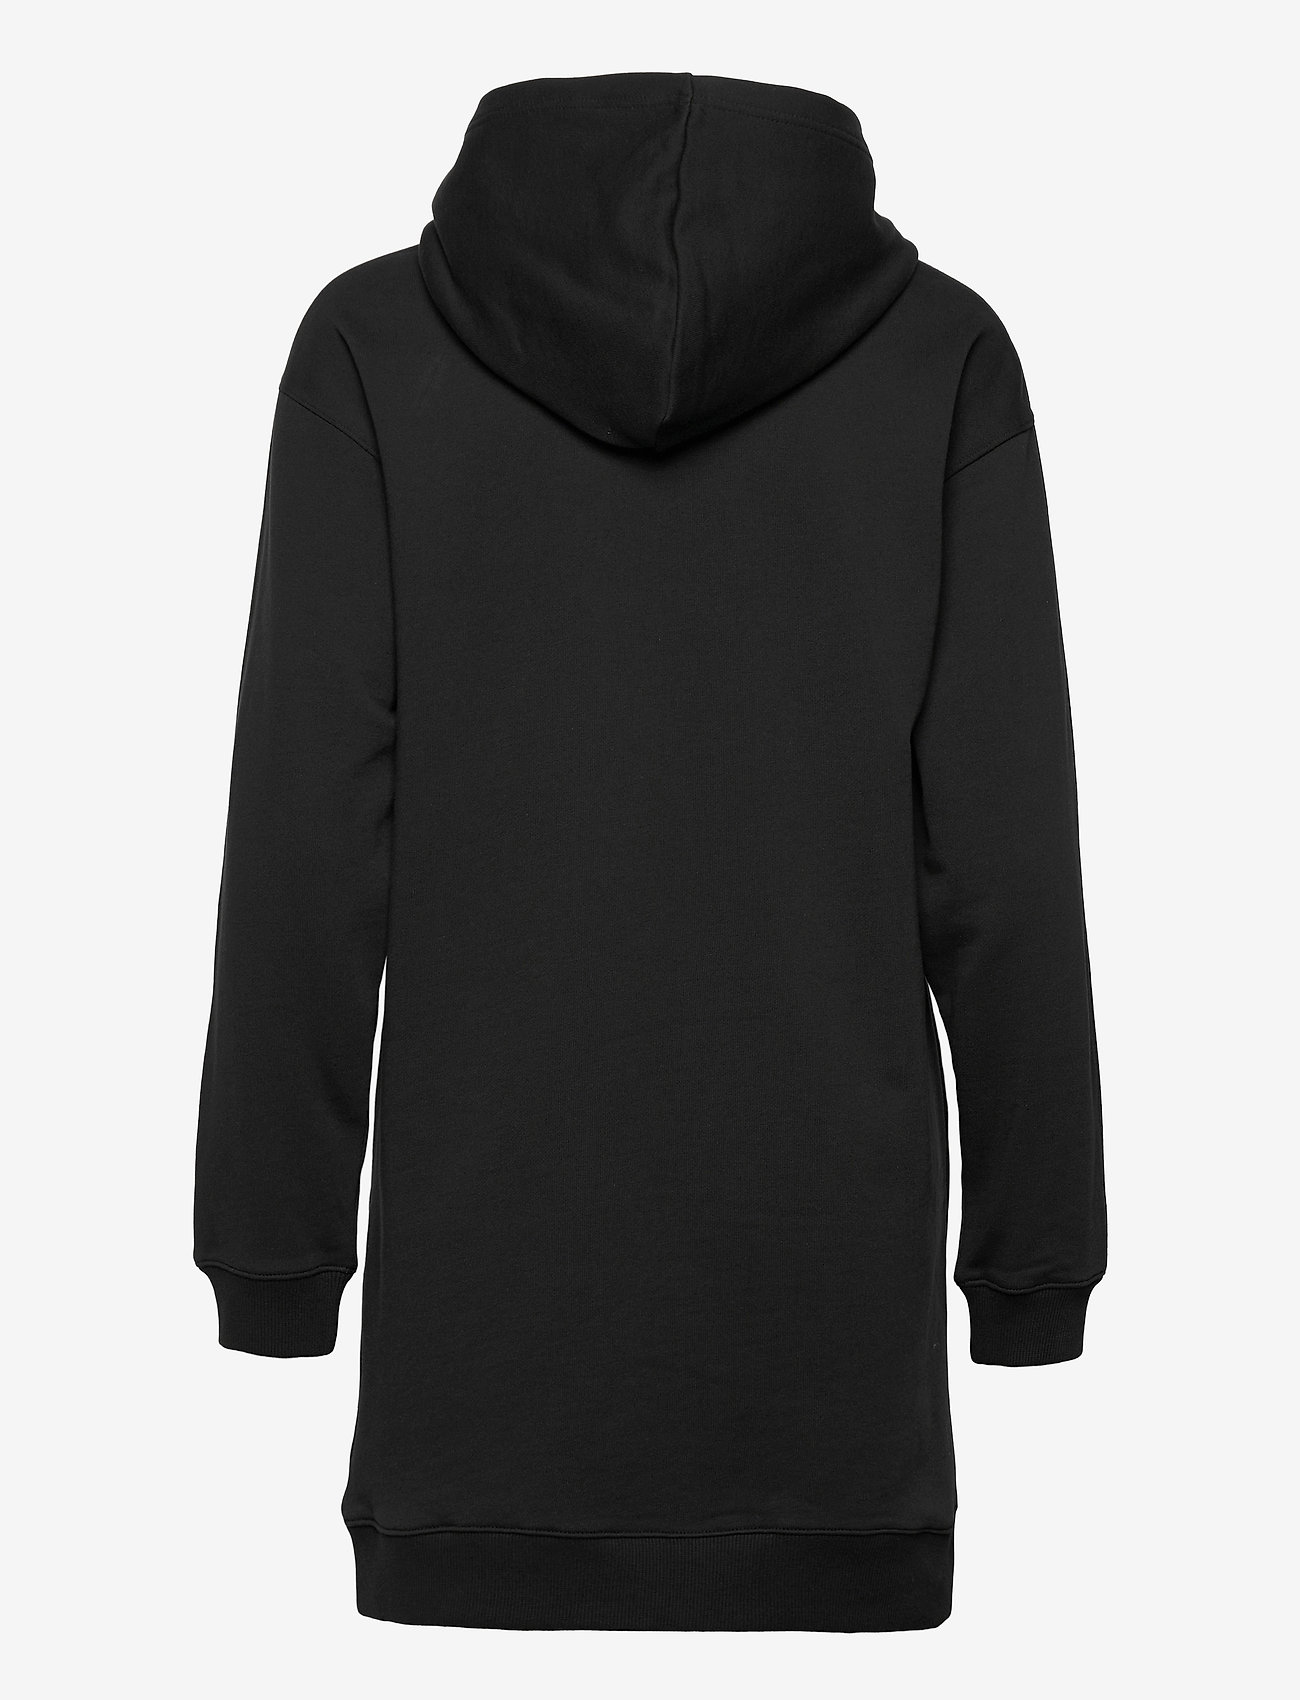 Calvin Klein Jeans - LOGO TRIM HOODIE DRESS - hverdagskjoler - ck black - 1